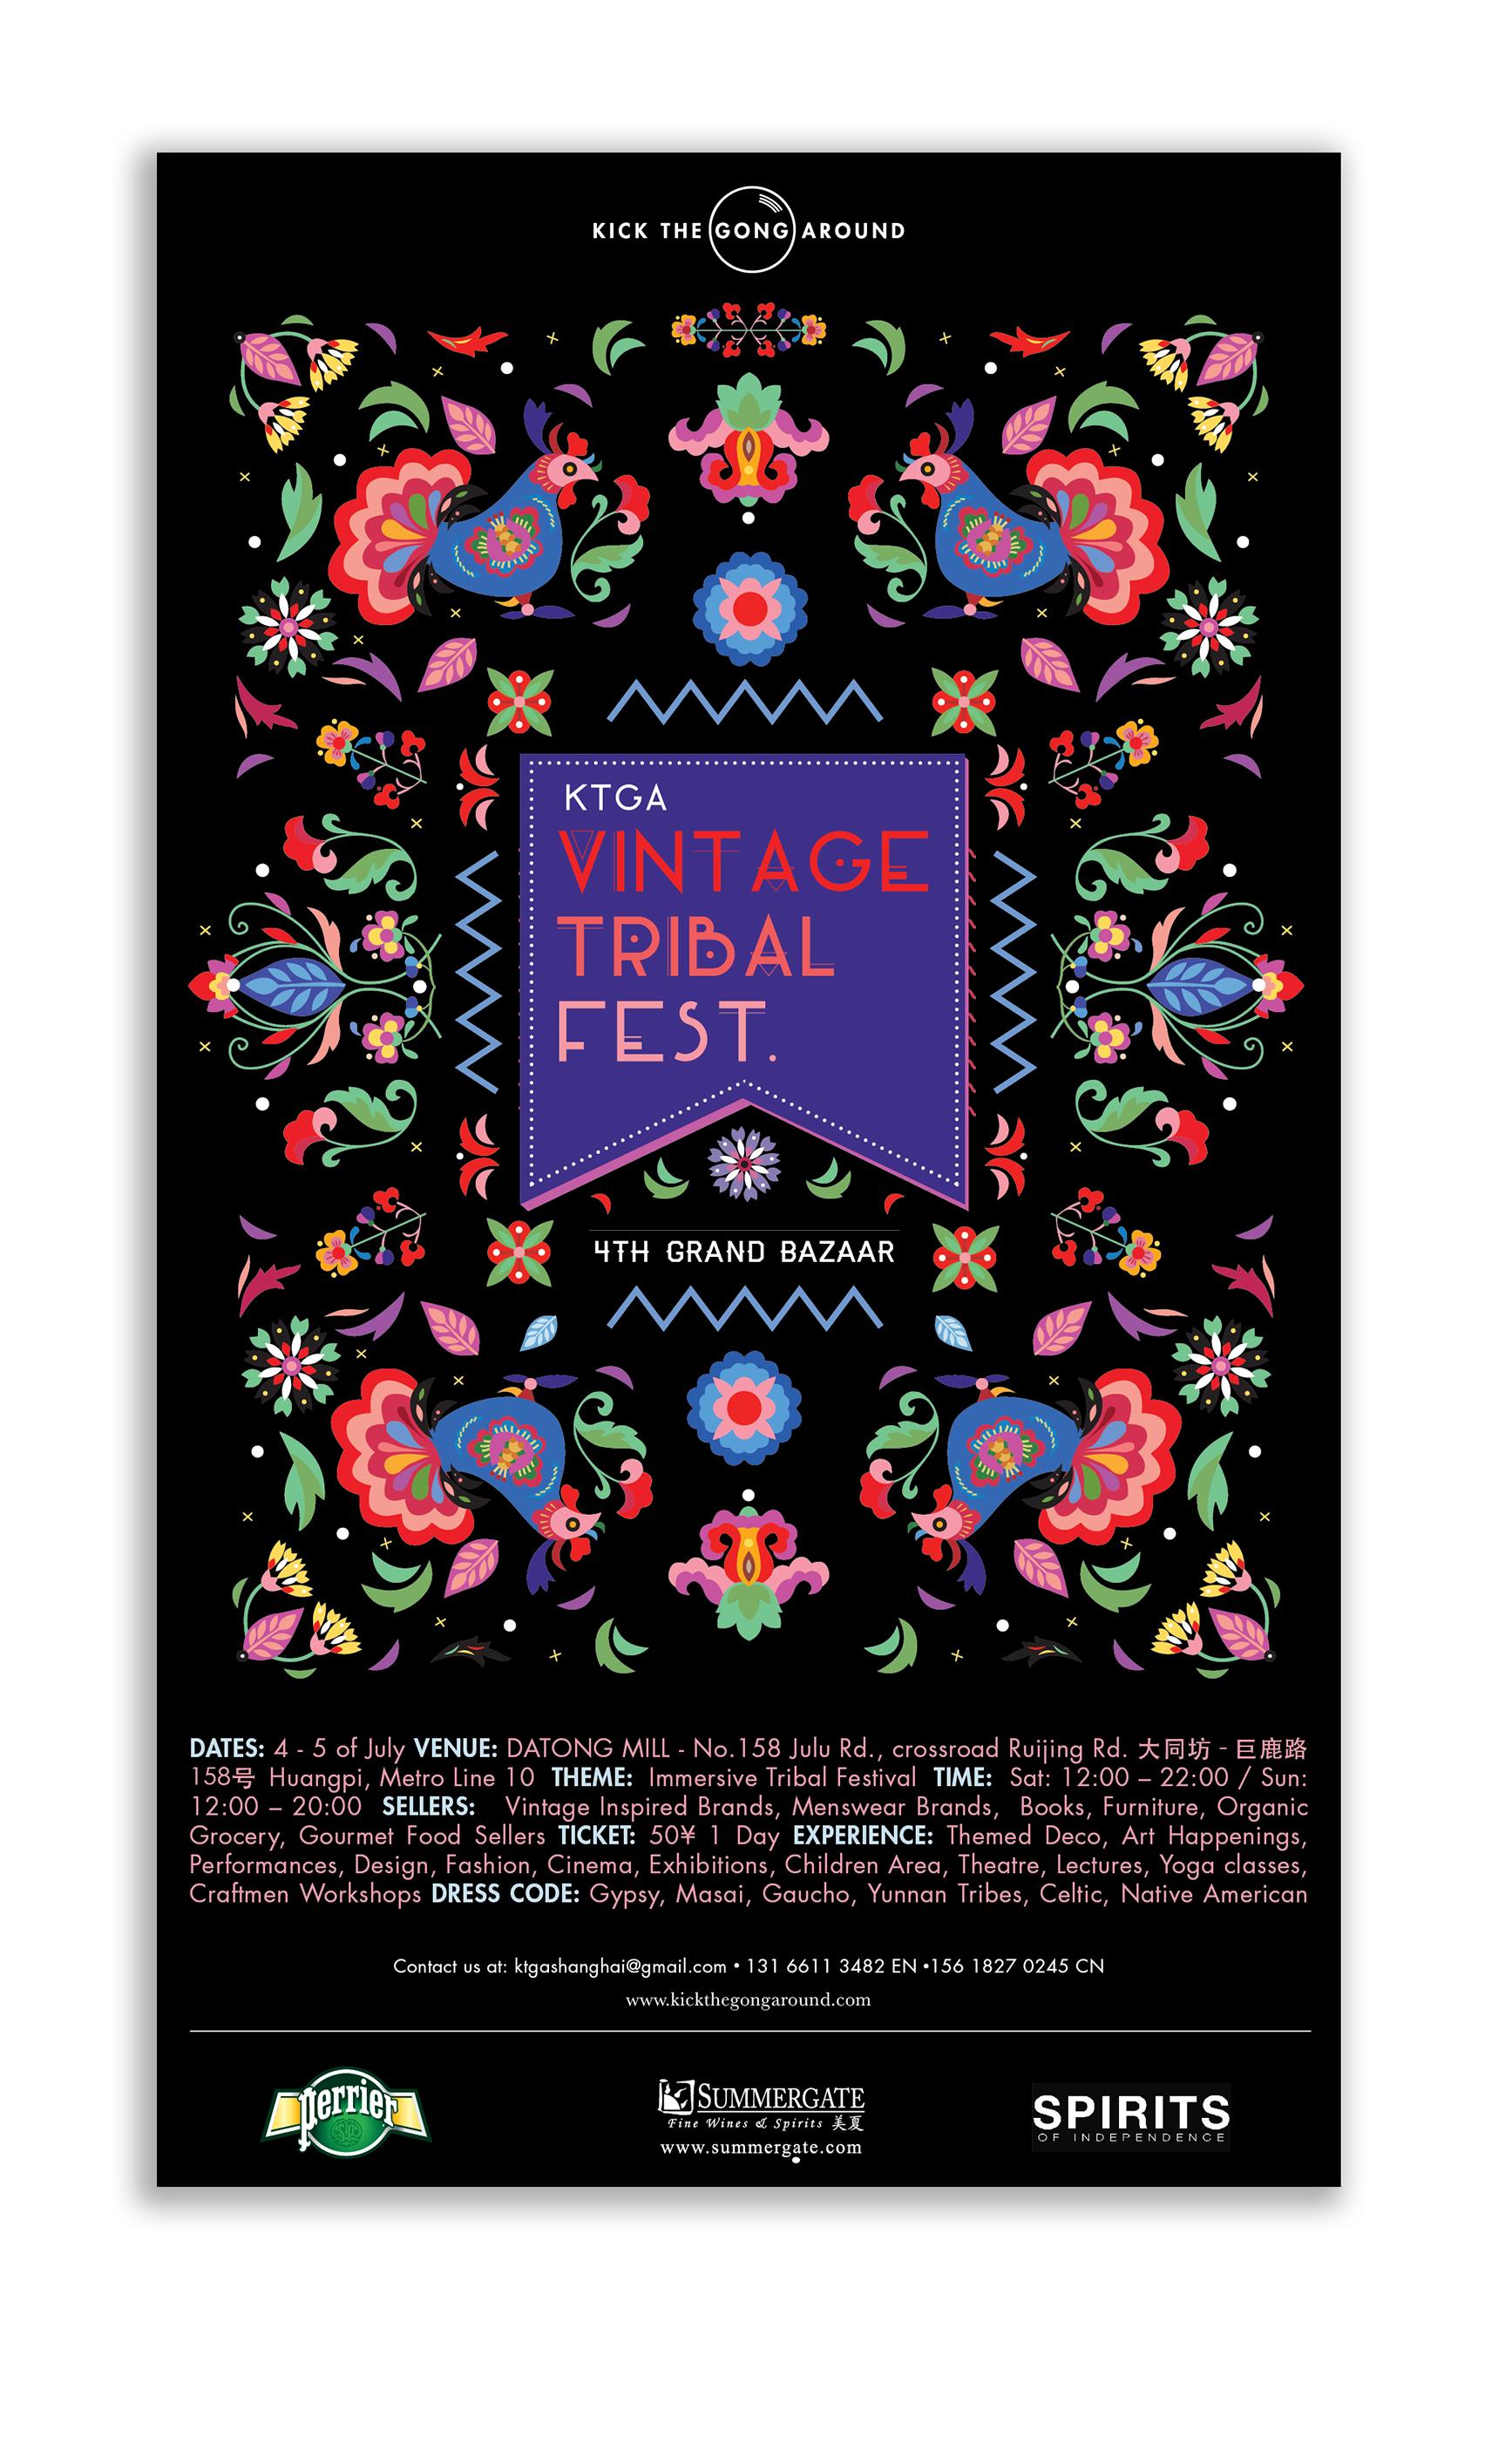 Vintage Tribal Fest